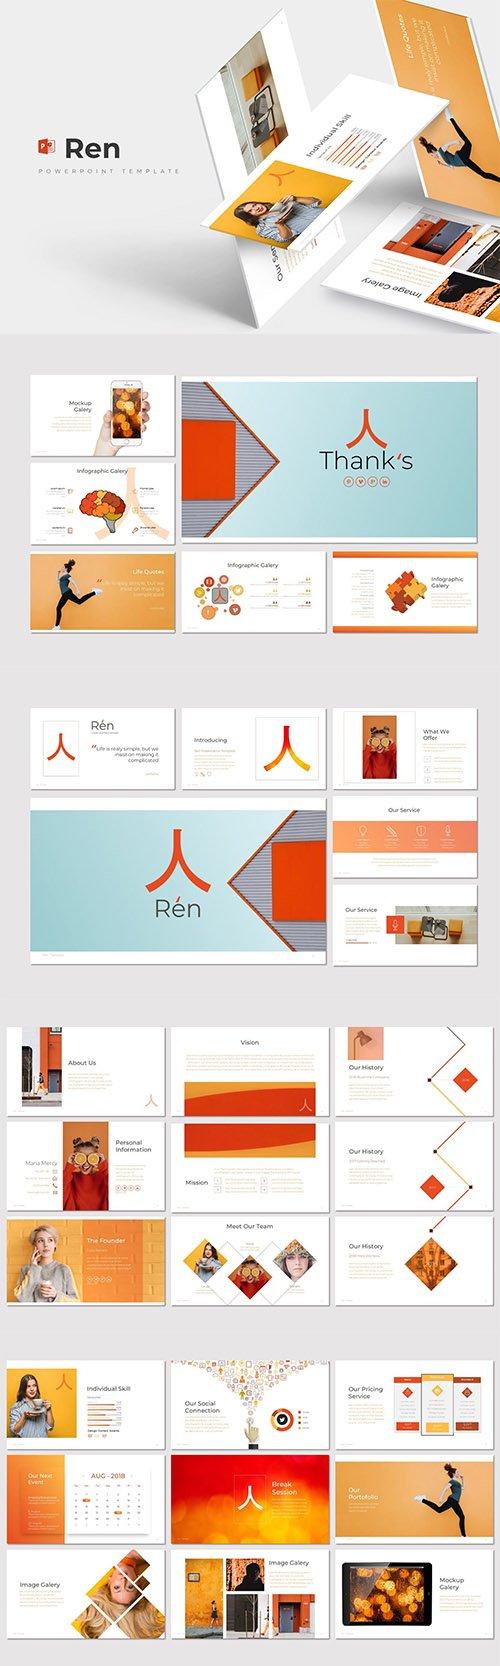 Ren - Powerpoint, Keynote and Google Slides Template